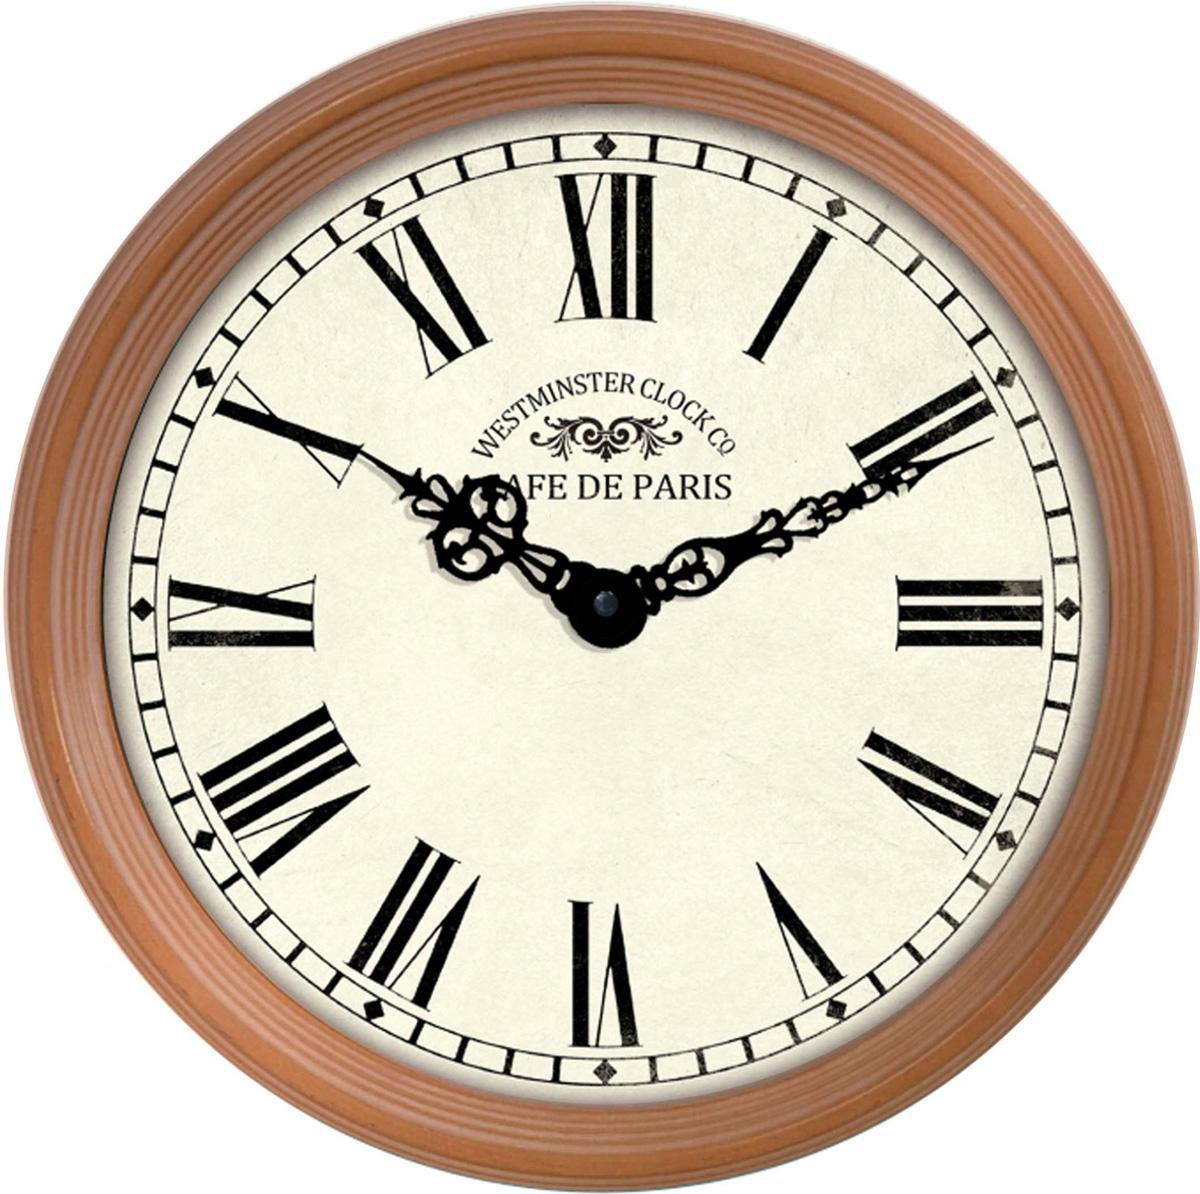 "Часы настенные ""Innova"", цвет: бронзовый, диаметр 38 см. W09645"